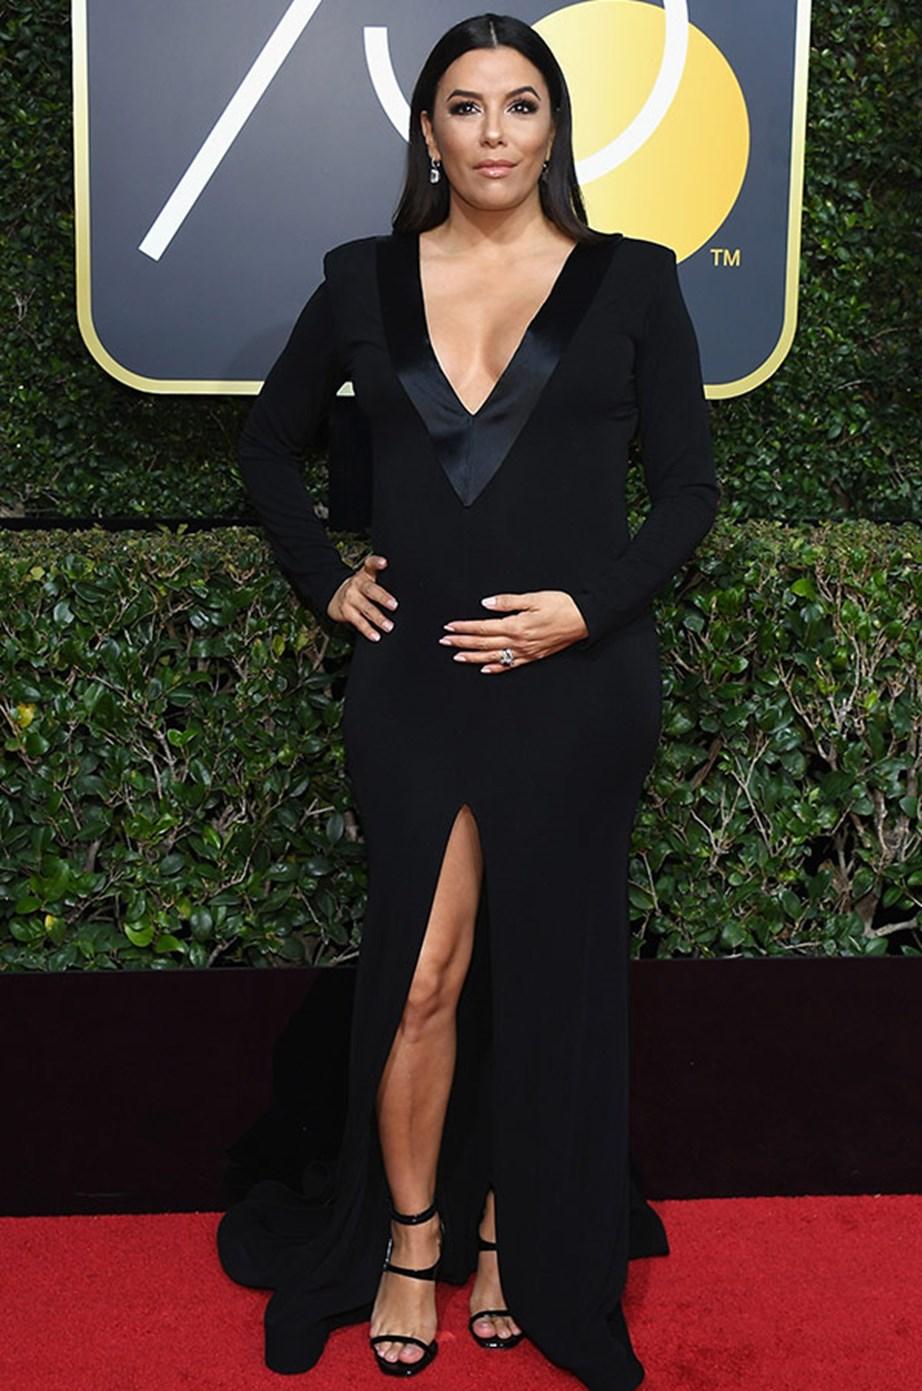 Eva Longoria Bastón at the Golden Globe Awards.